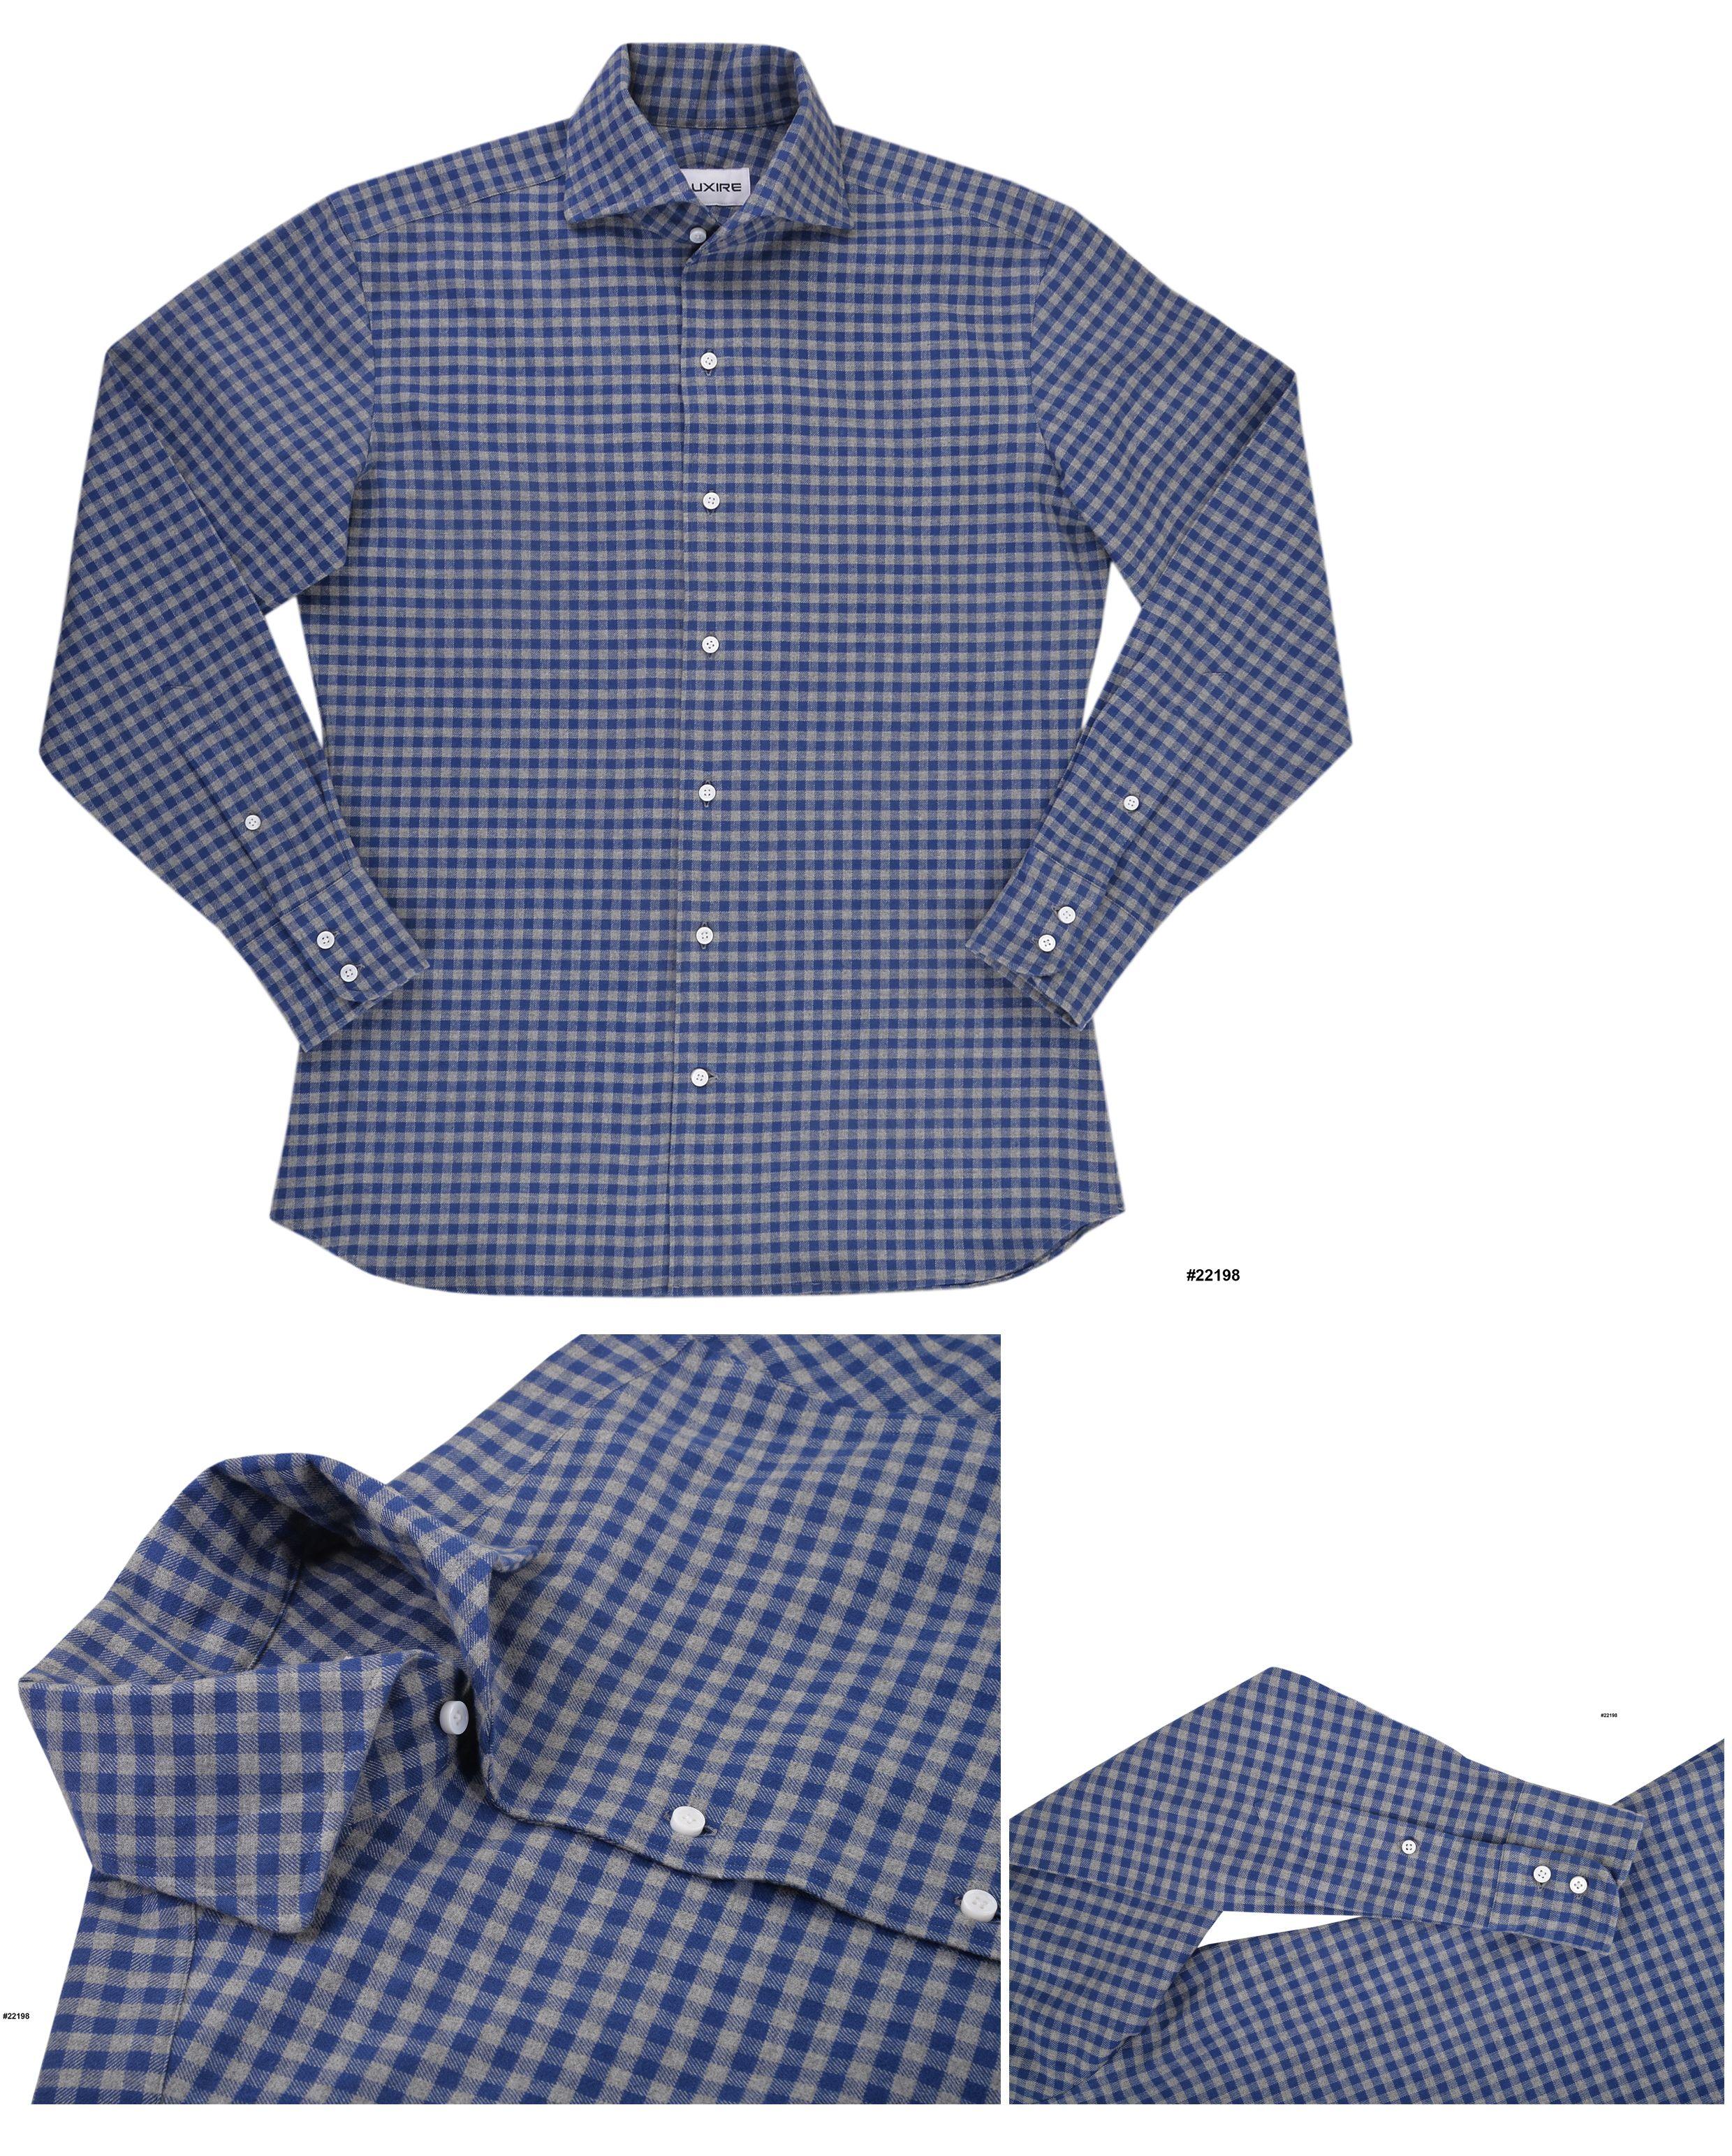 Blue Indigo Grey Gingham Flannel Work Shirt Luxire Shirts Shirts